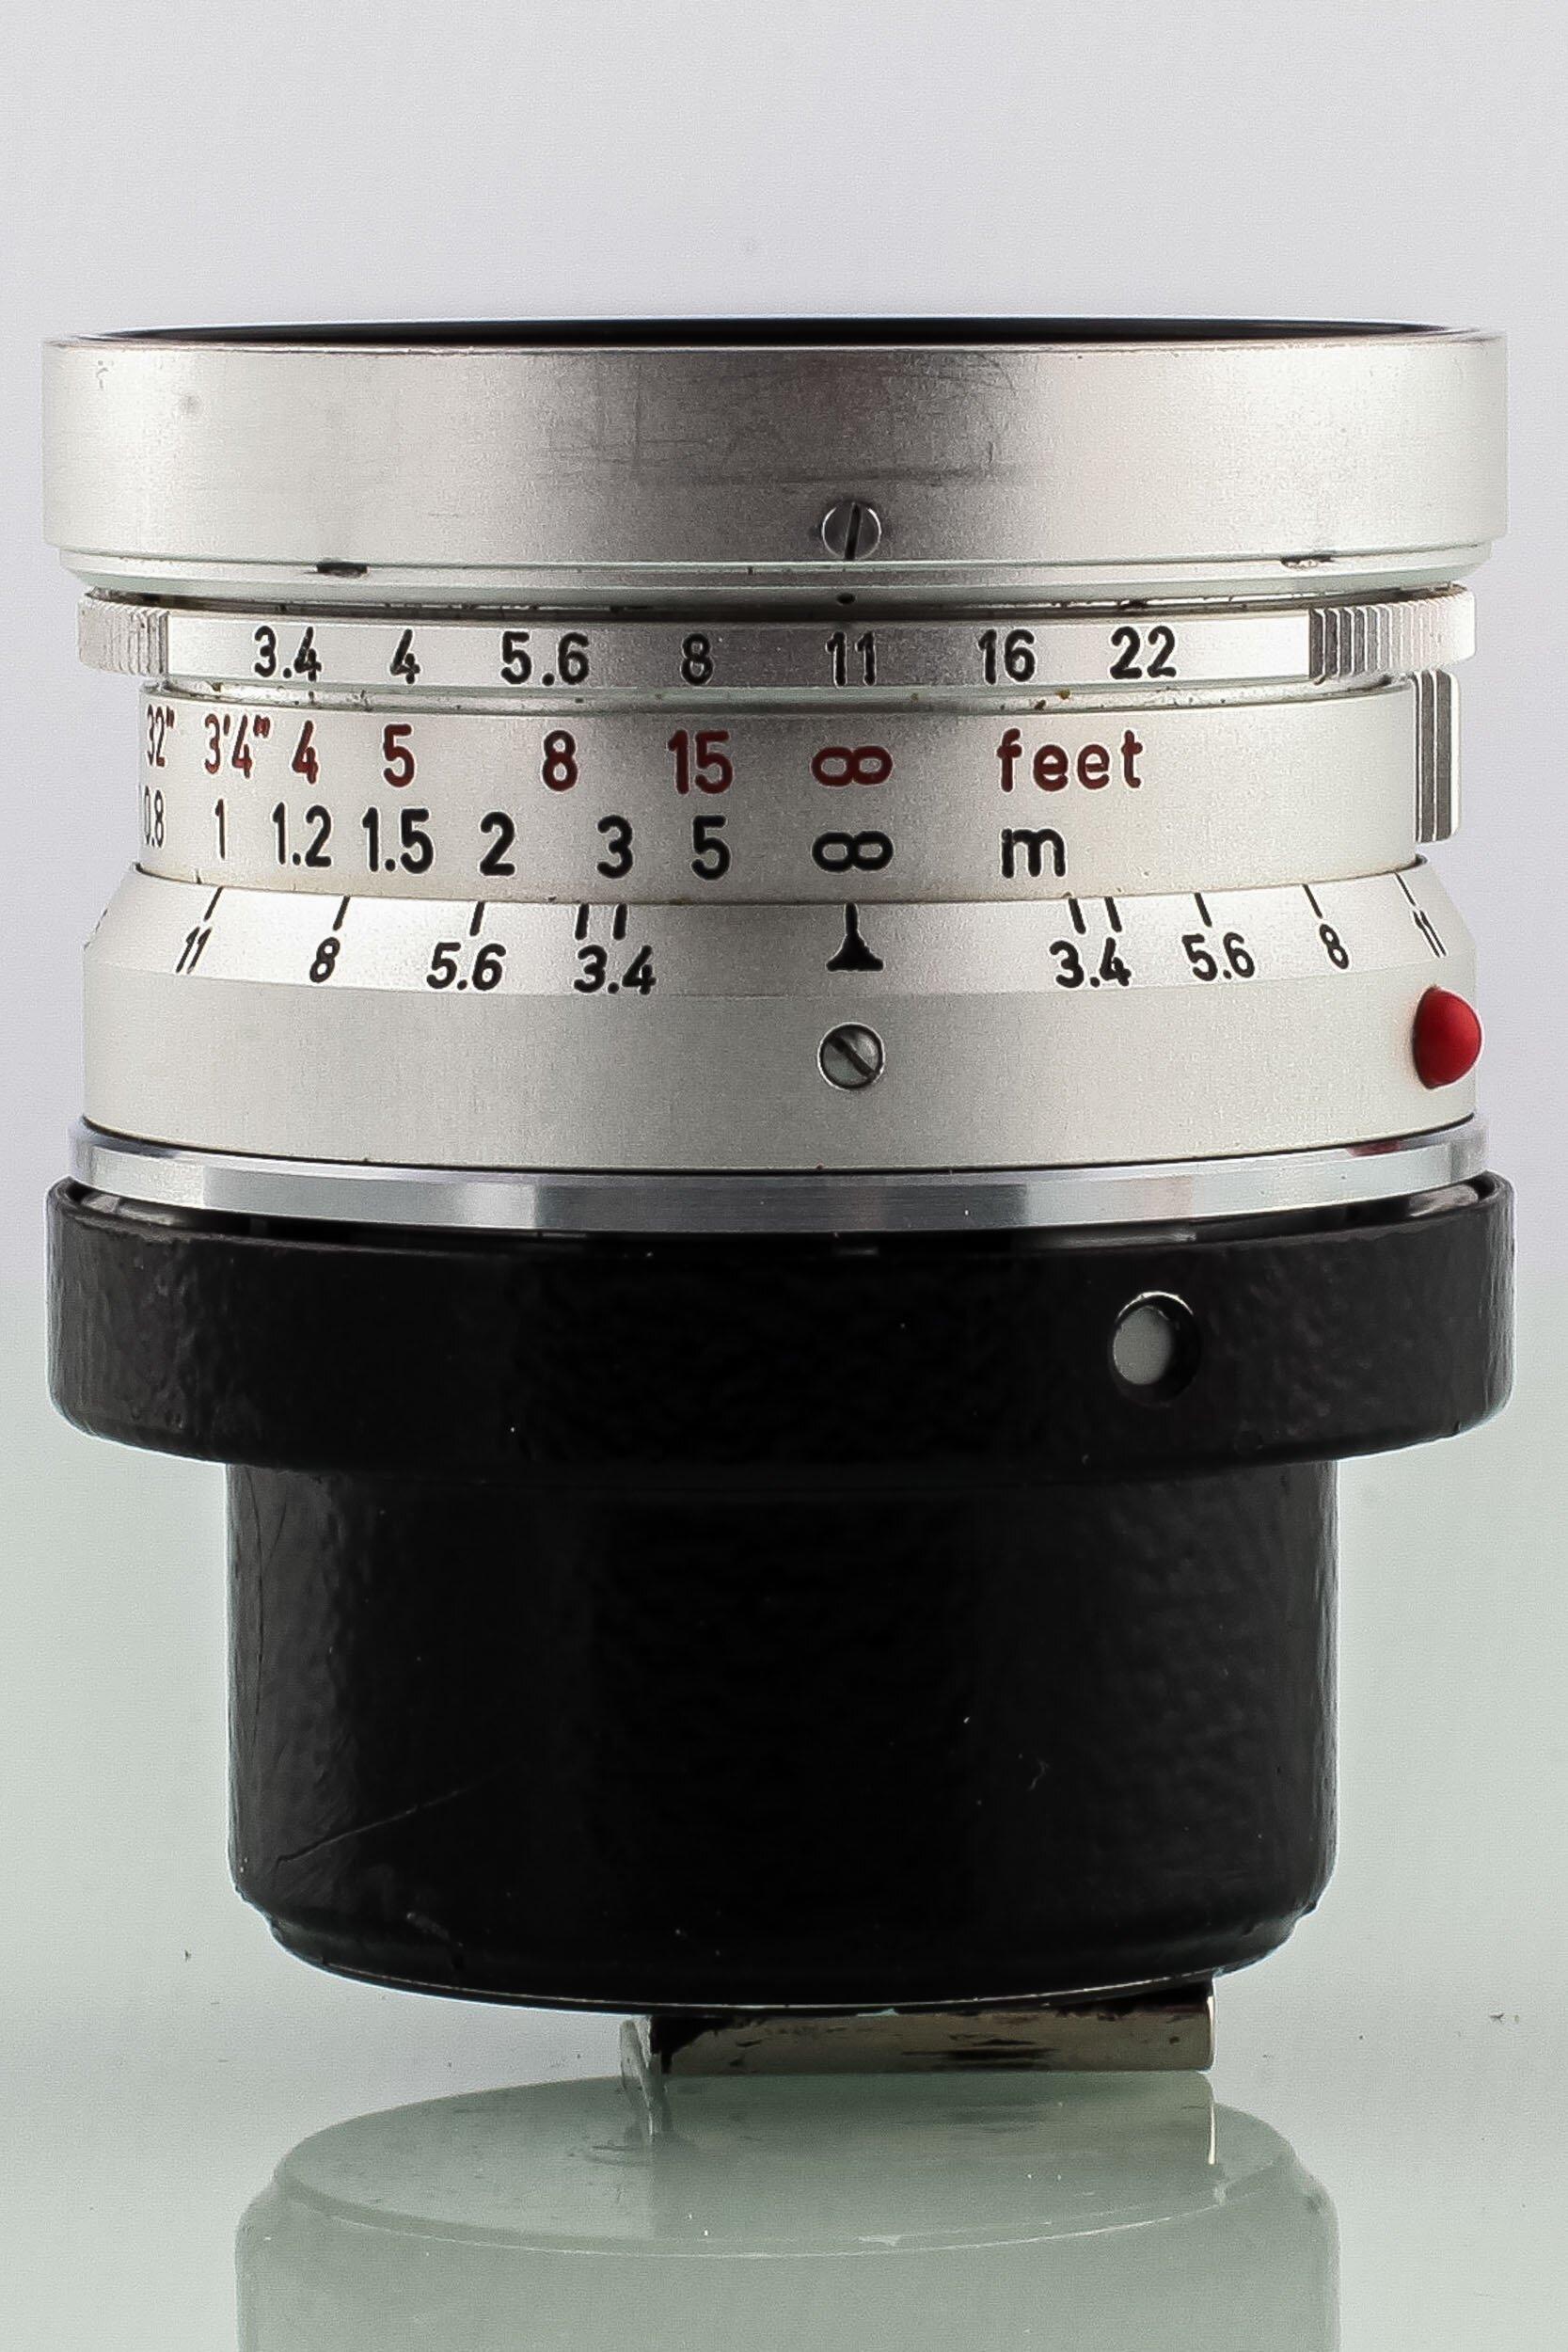 Leica Super-Angulon-M 3,4/21mm Weitwinkelobjektiv